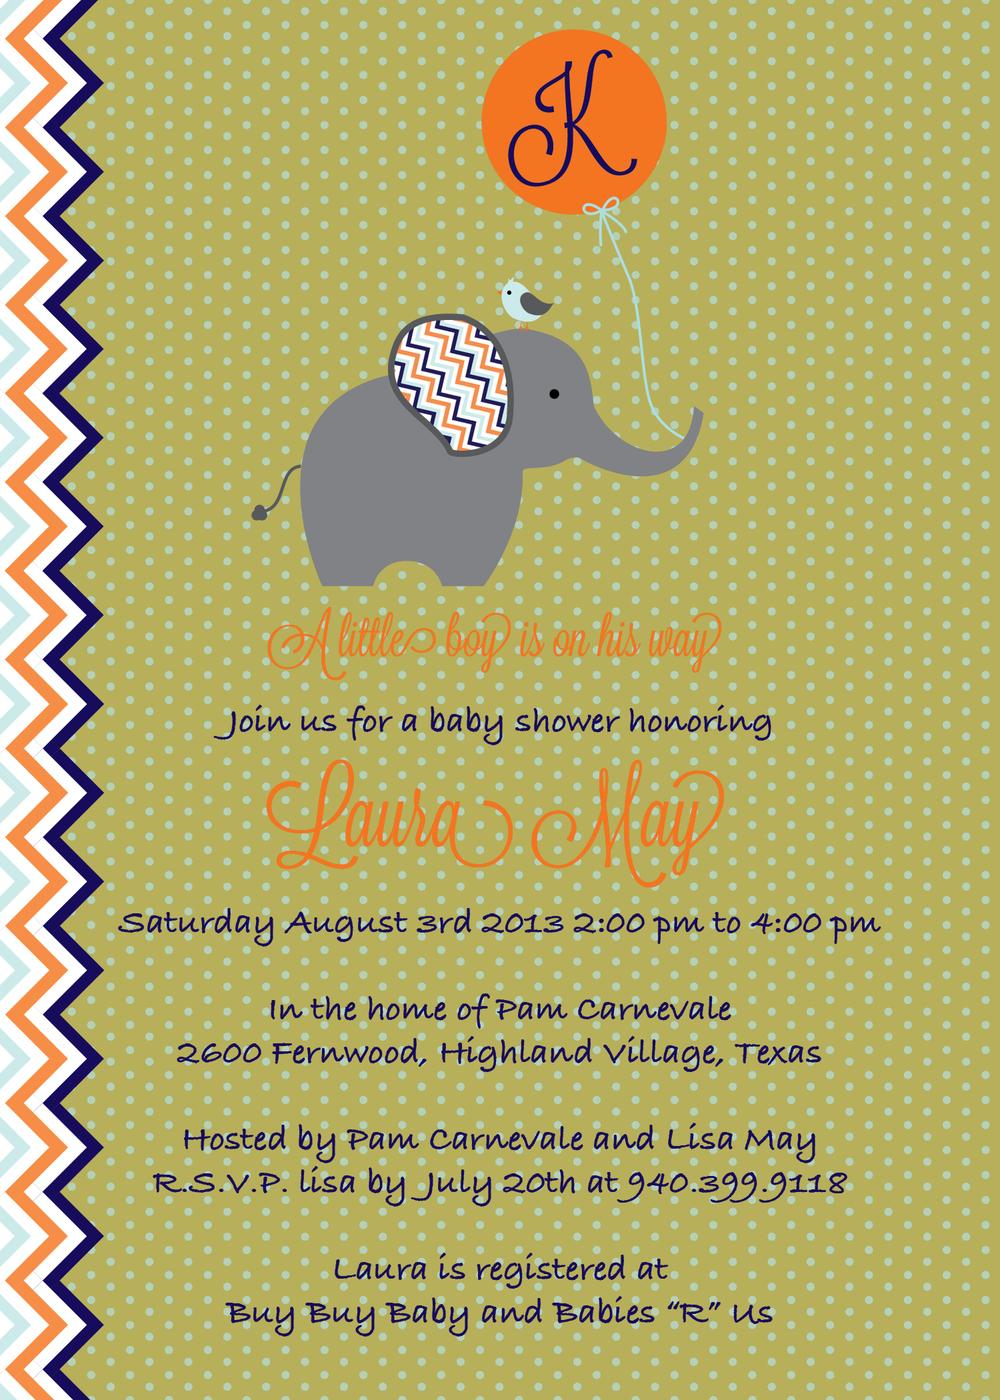 Baby Shower Invitation.jpg